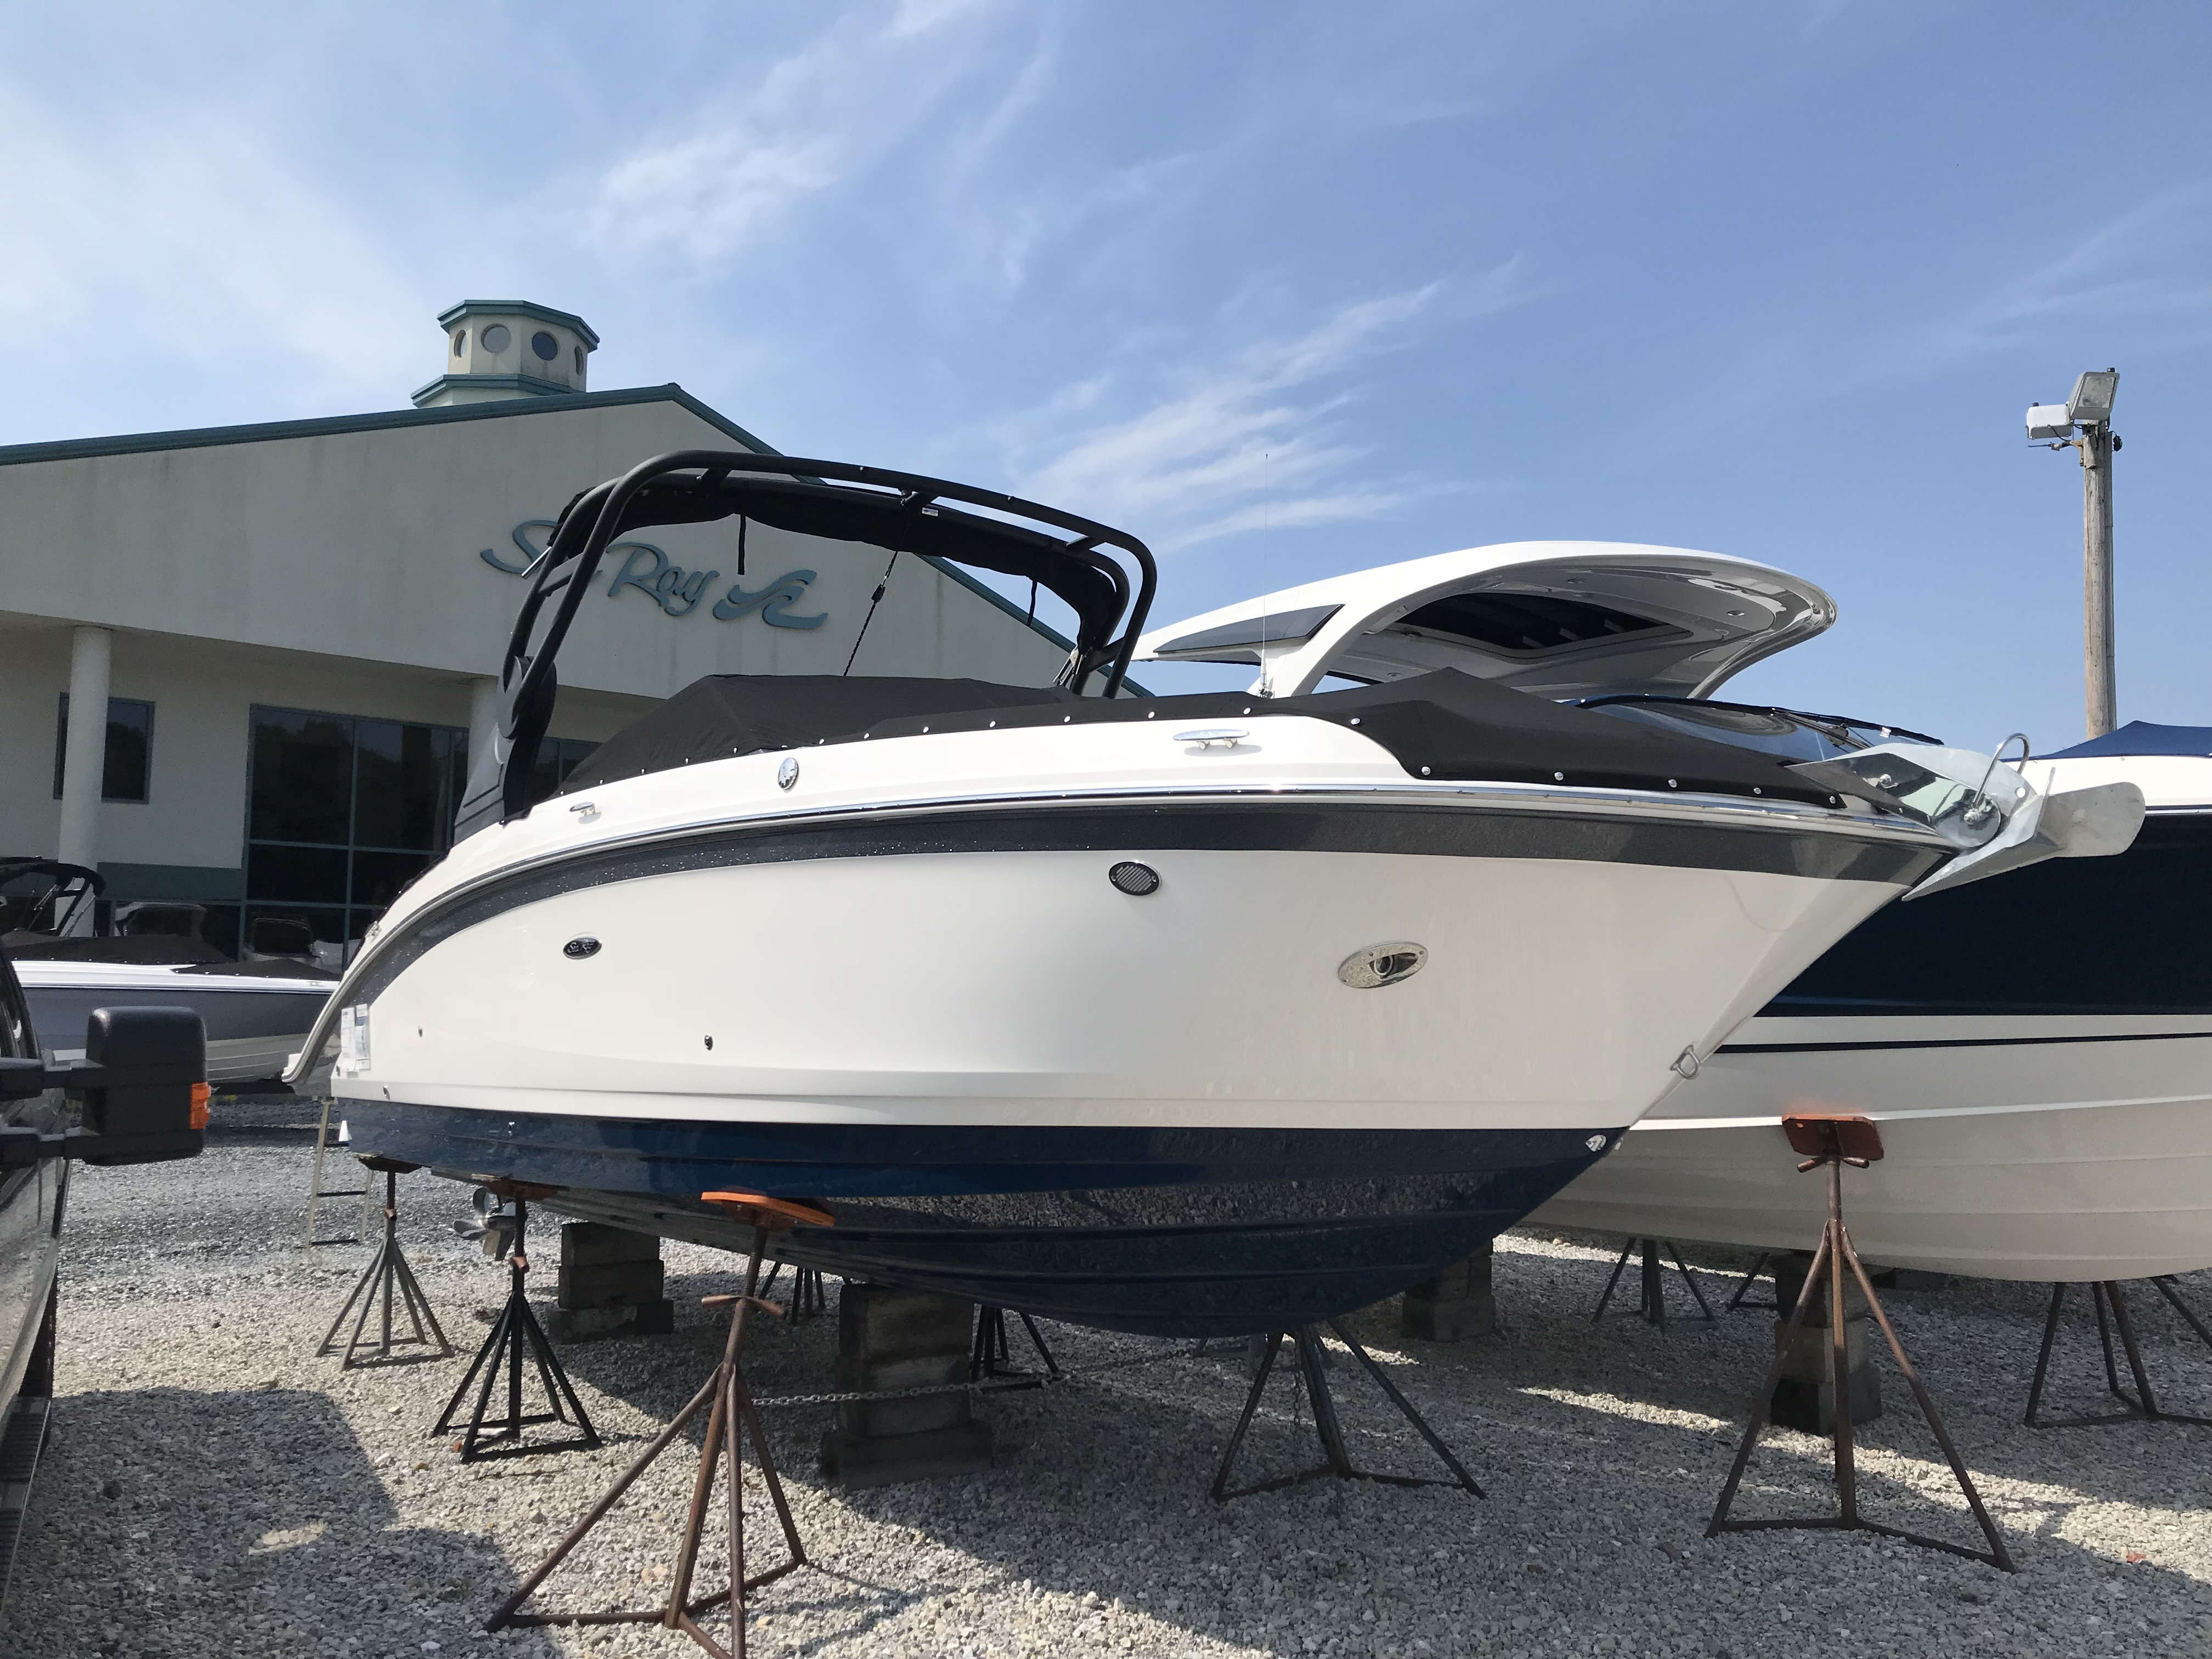 Sea Ray 270 Ob Boats For Sale Boats Com